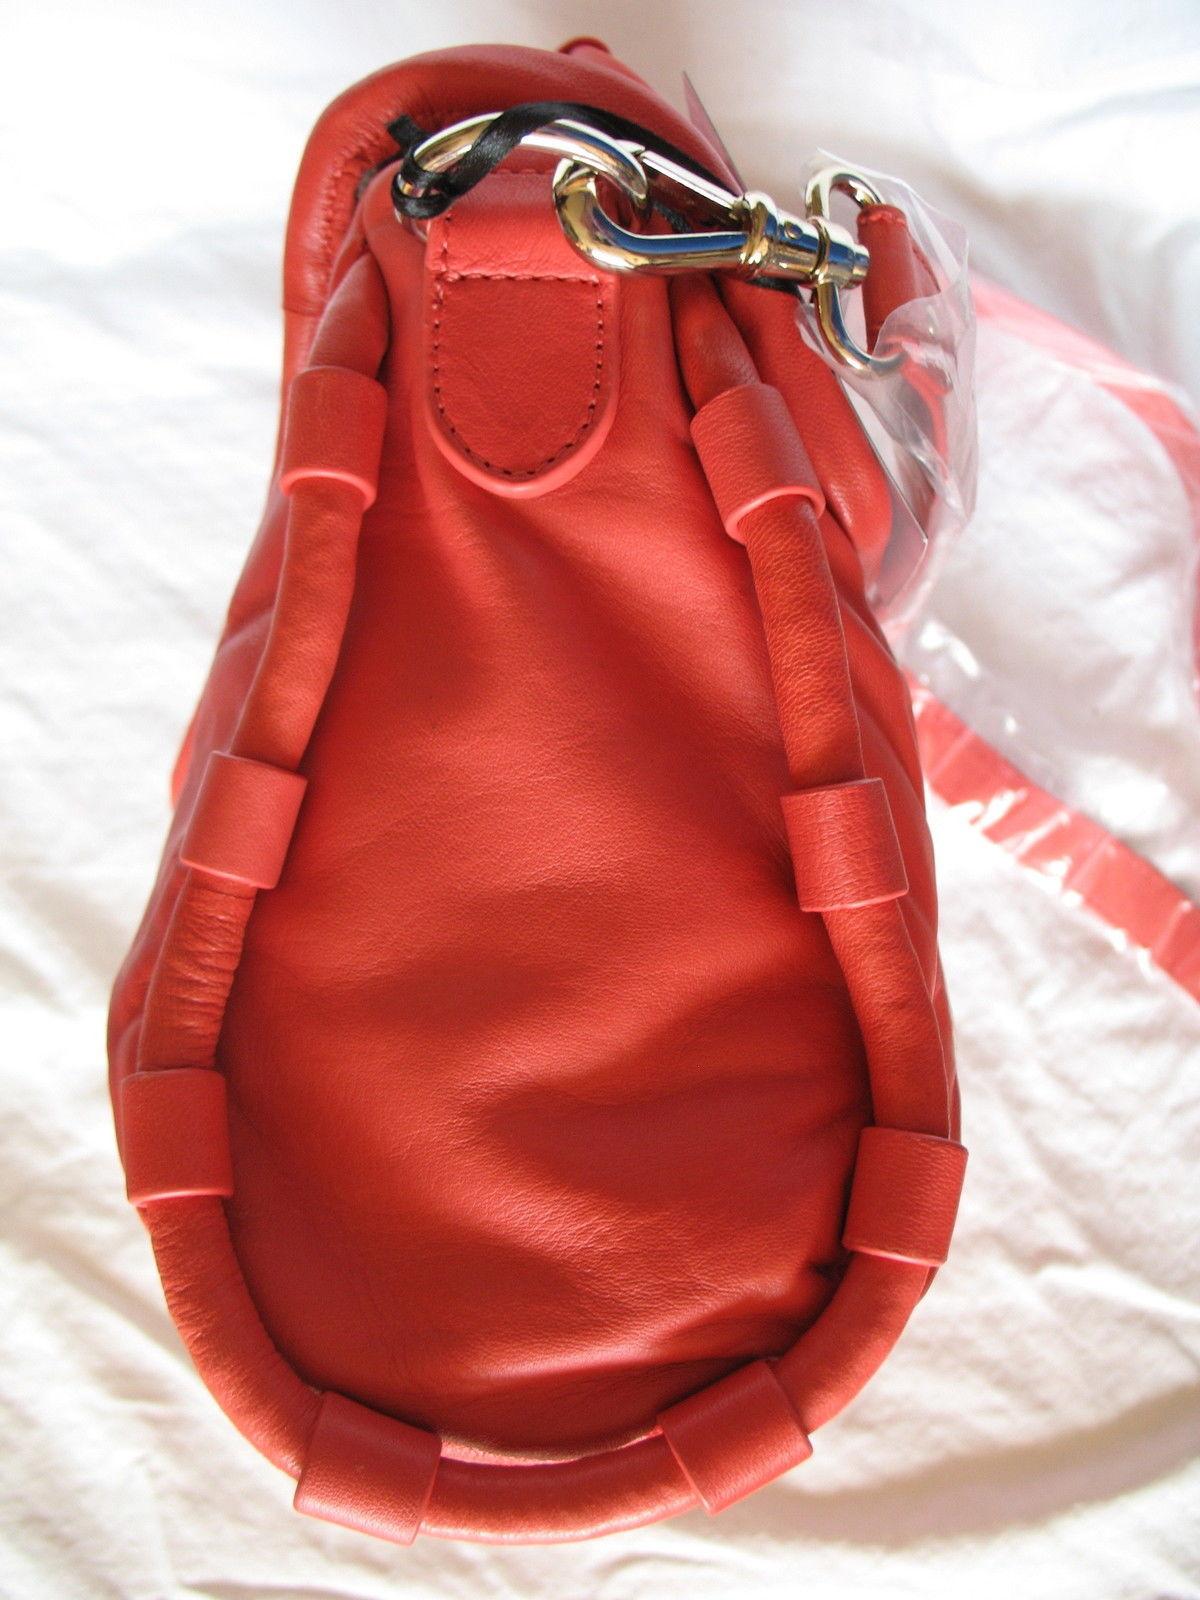 Cynthia Rowley New Purse Handbag Leather Crossbody Calloway Orange Coral White image 9